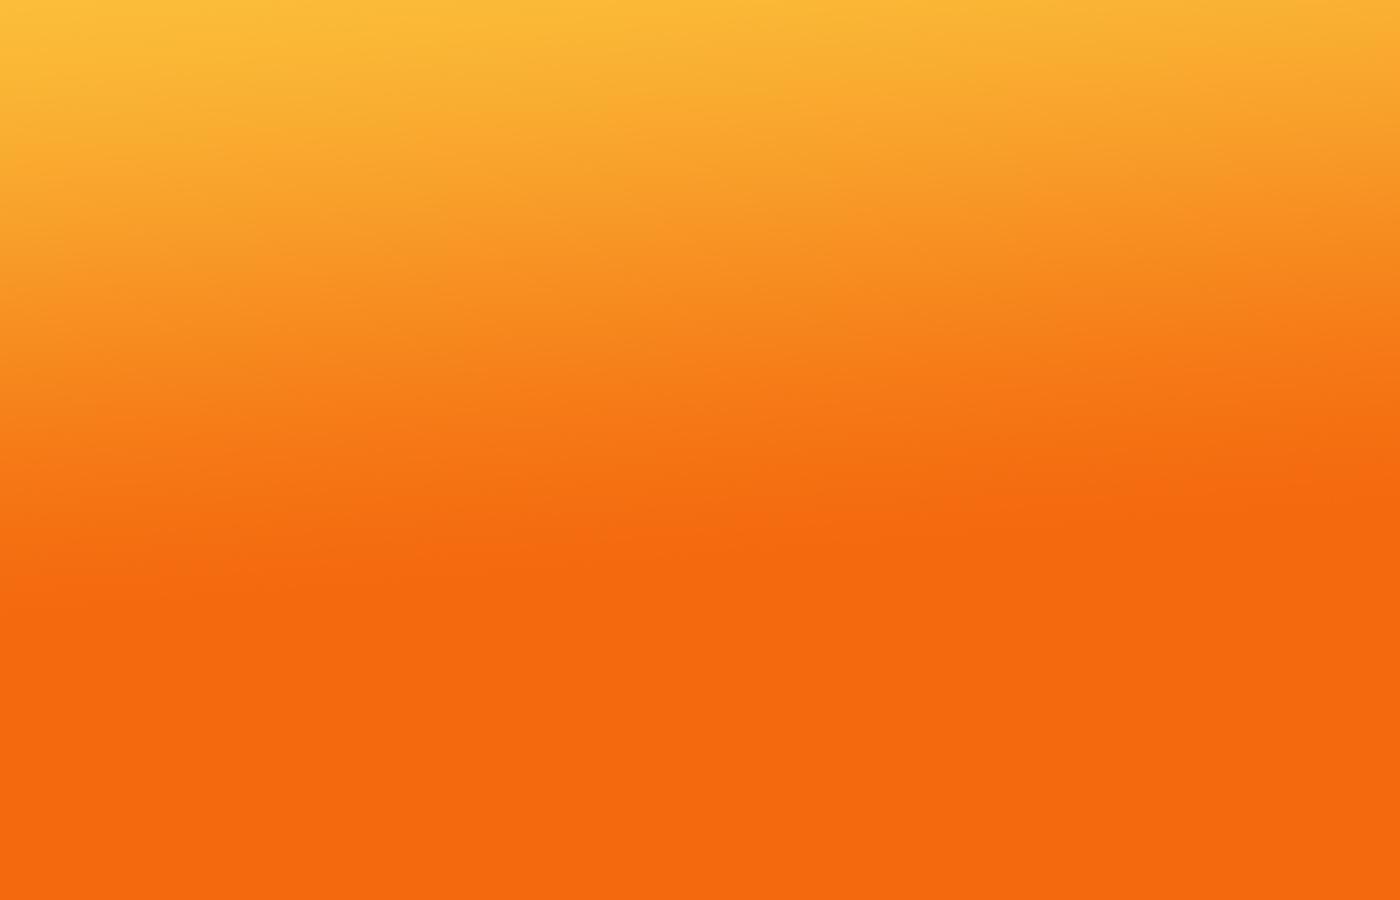 gradient orange orange gradient orange color gradient background 1400x900